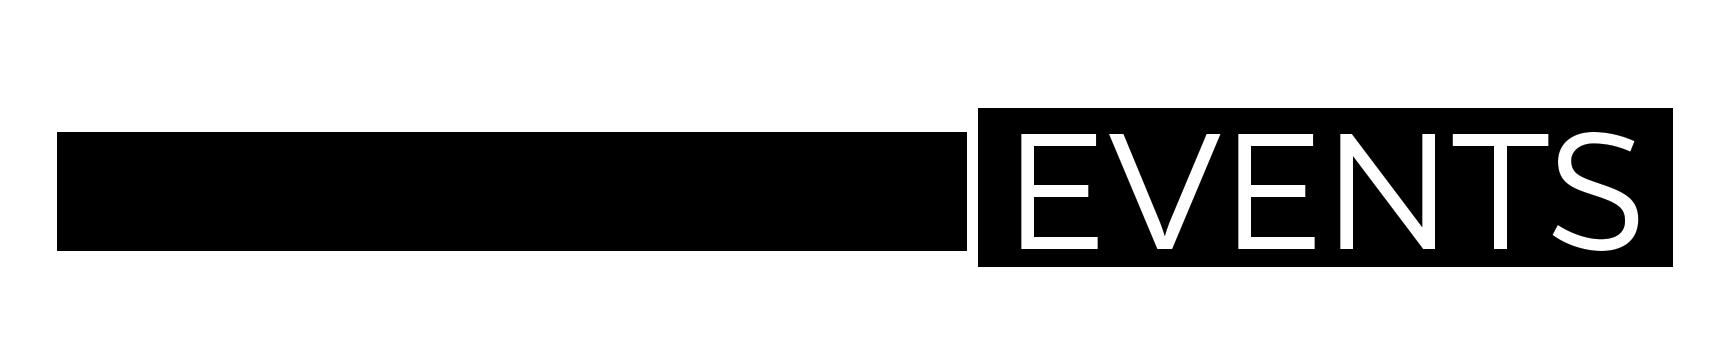 Sillybillyevents.ie Logo